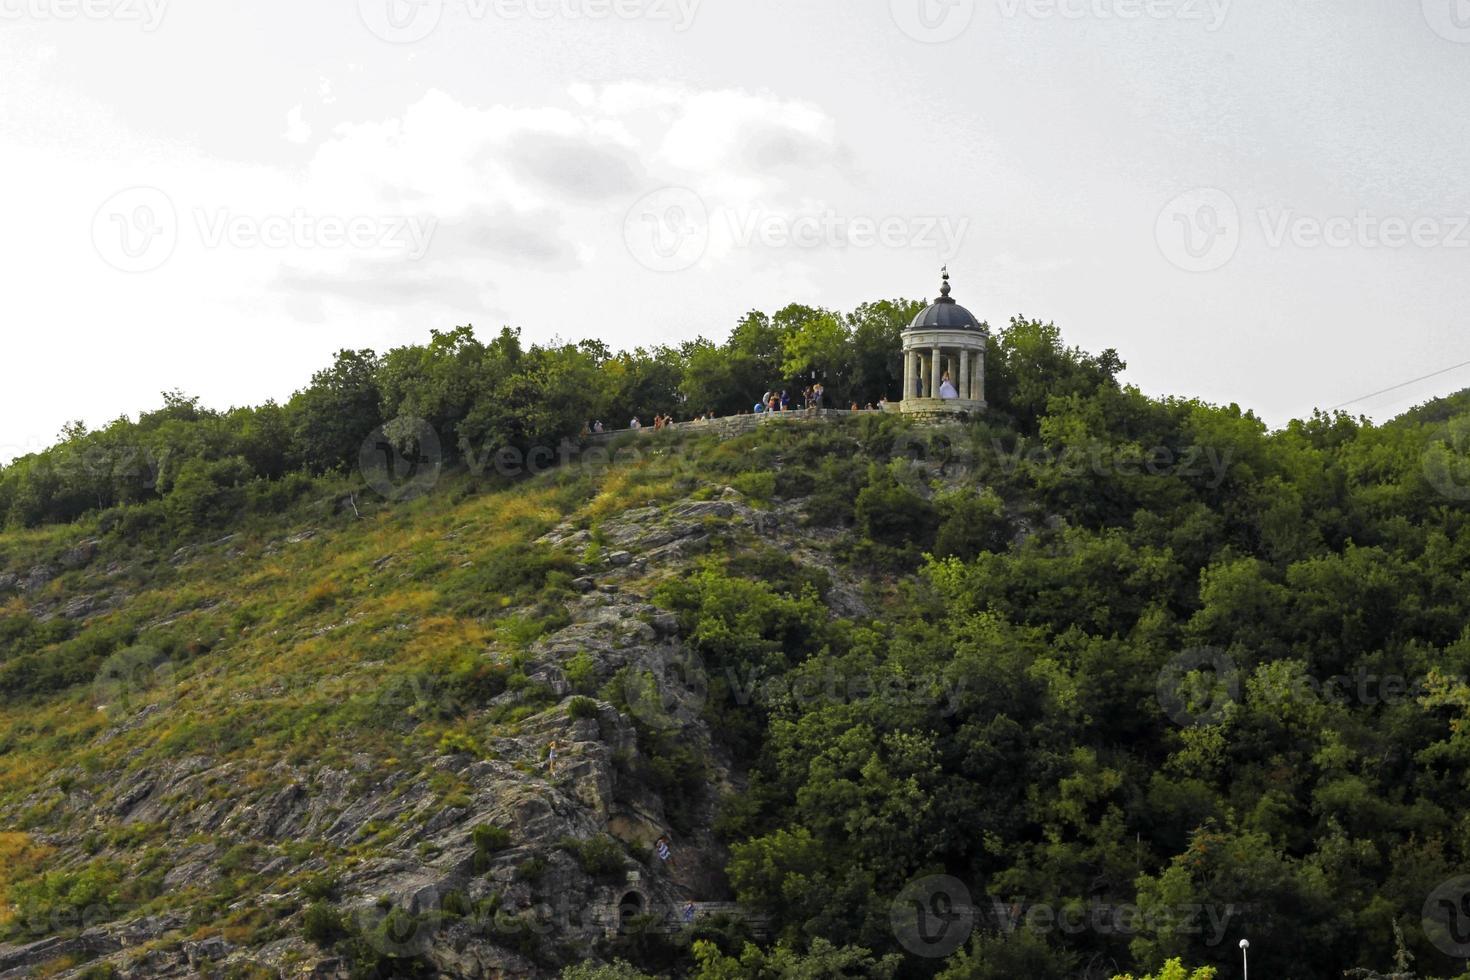 aeolus harp in de zomer. pyatigorsk oriëntatiepunten en monumenten foto